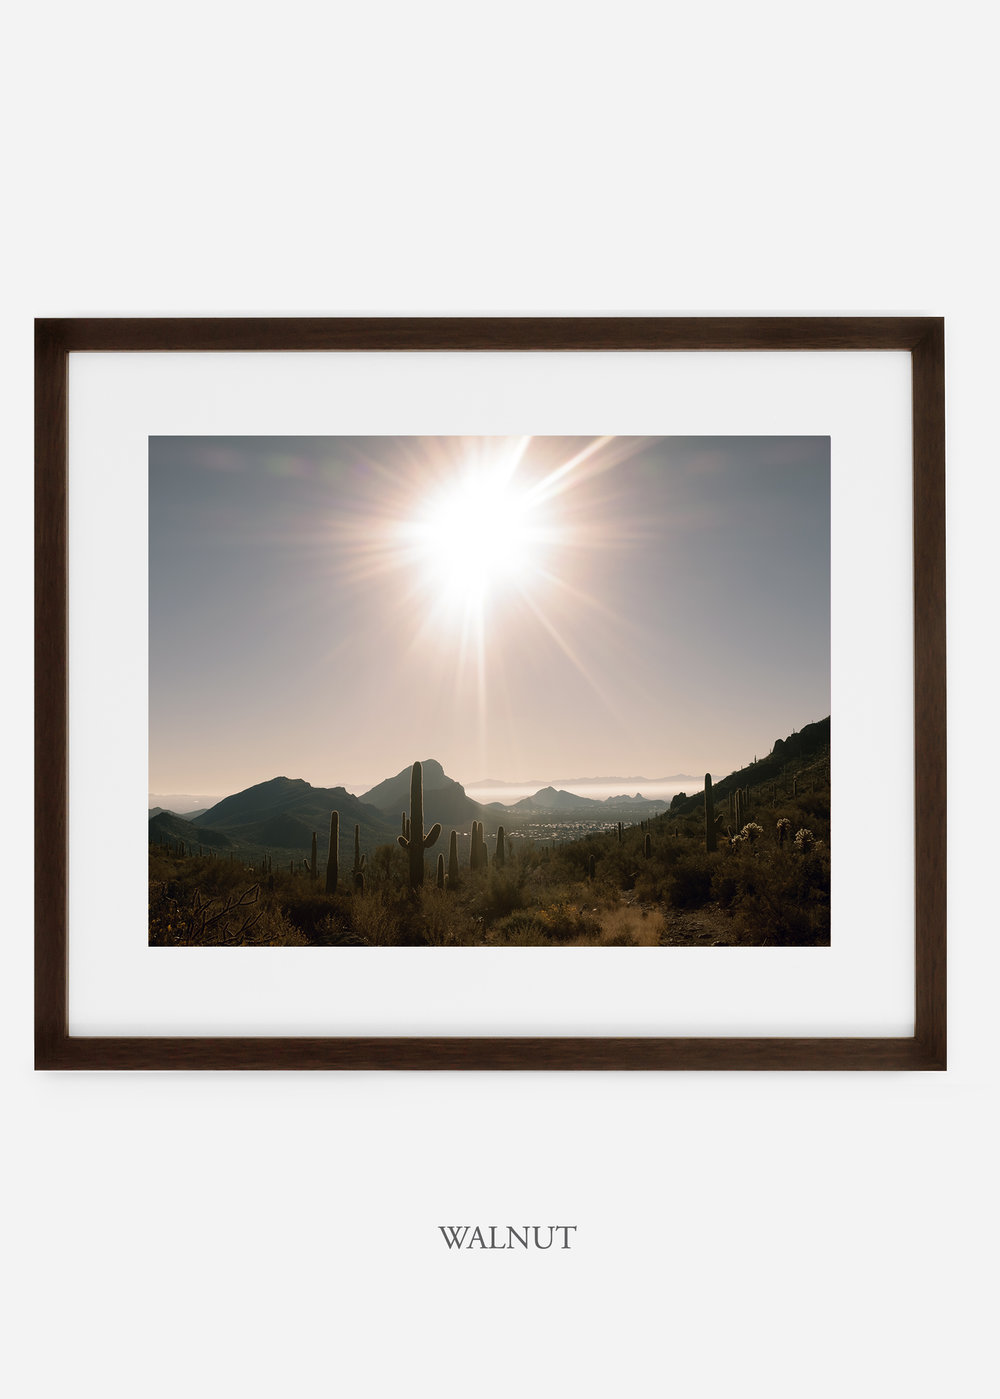 walnutframe-saguaroNo.15-wildercalifornia-art-wallart-cactusprint-homedecor-prints-arizona-botanical-artwork-interiordesign.jpg